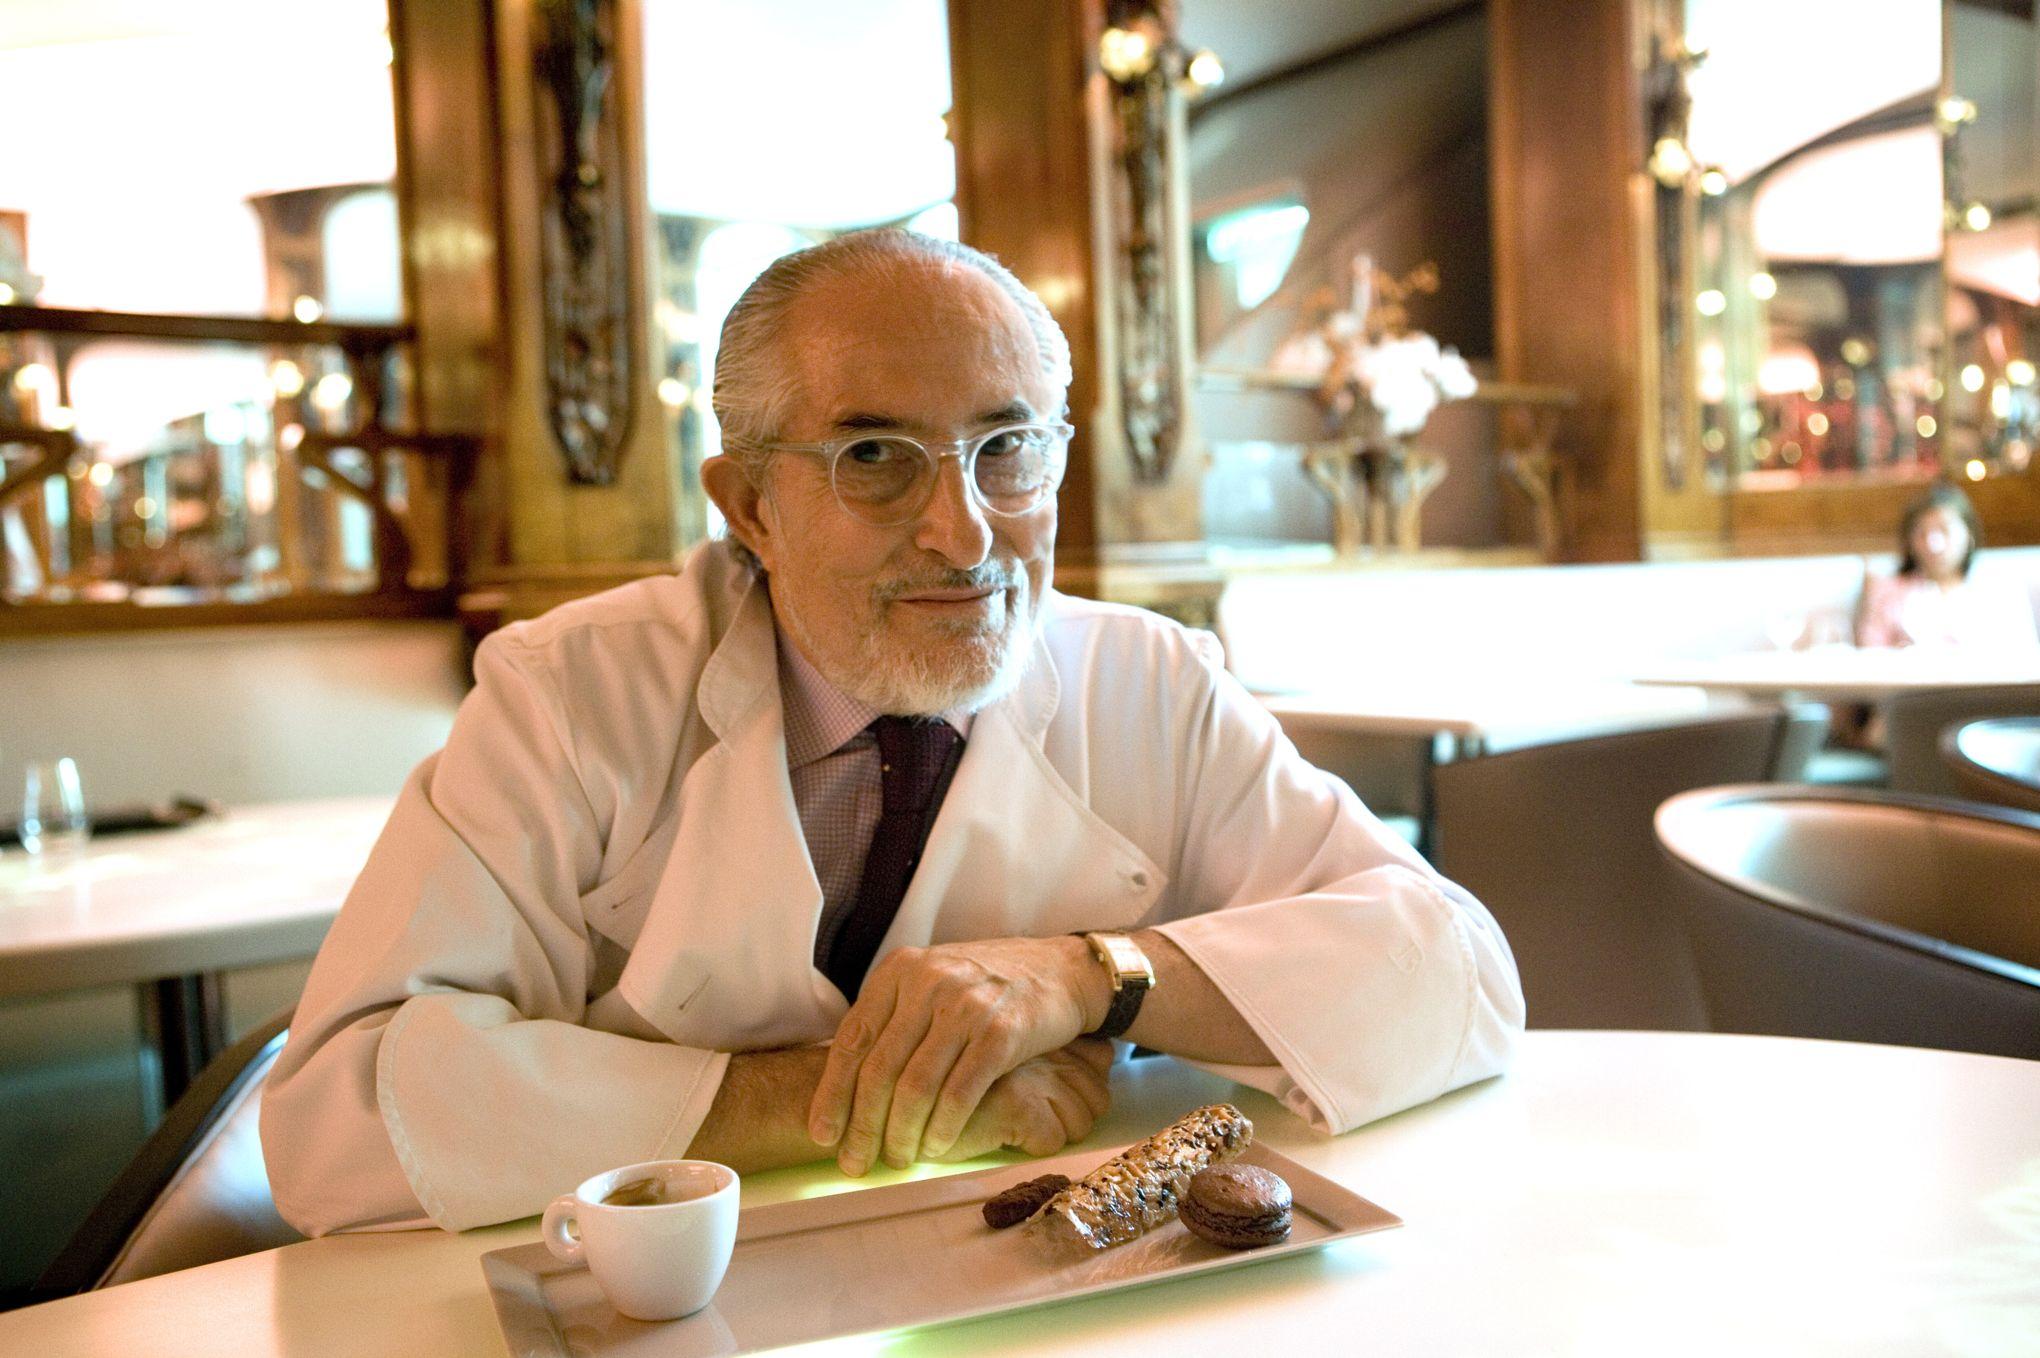 Alain senderens le cuisinier qui renversa la table for Cuisinier 94 photos